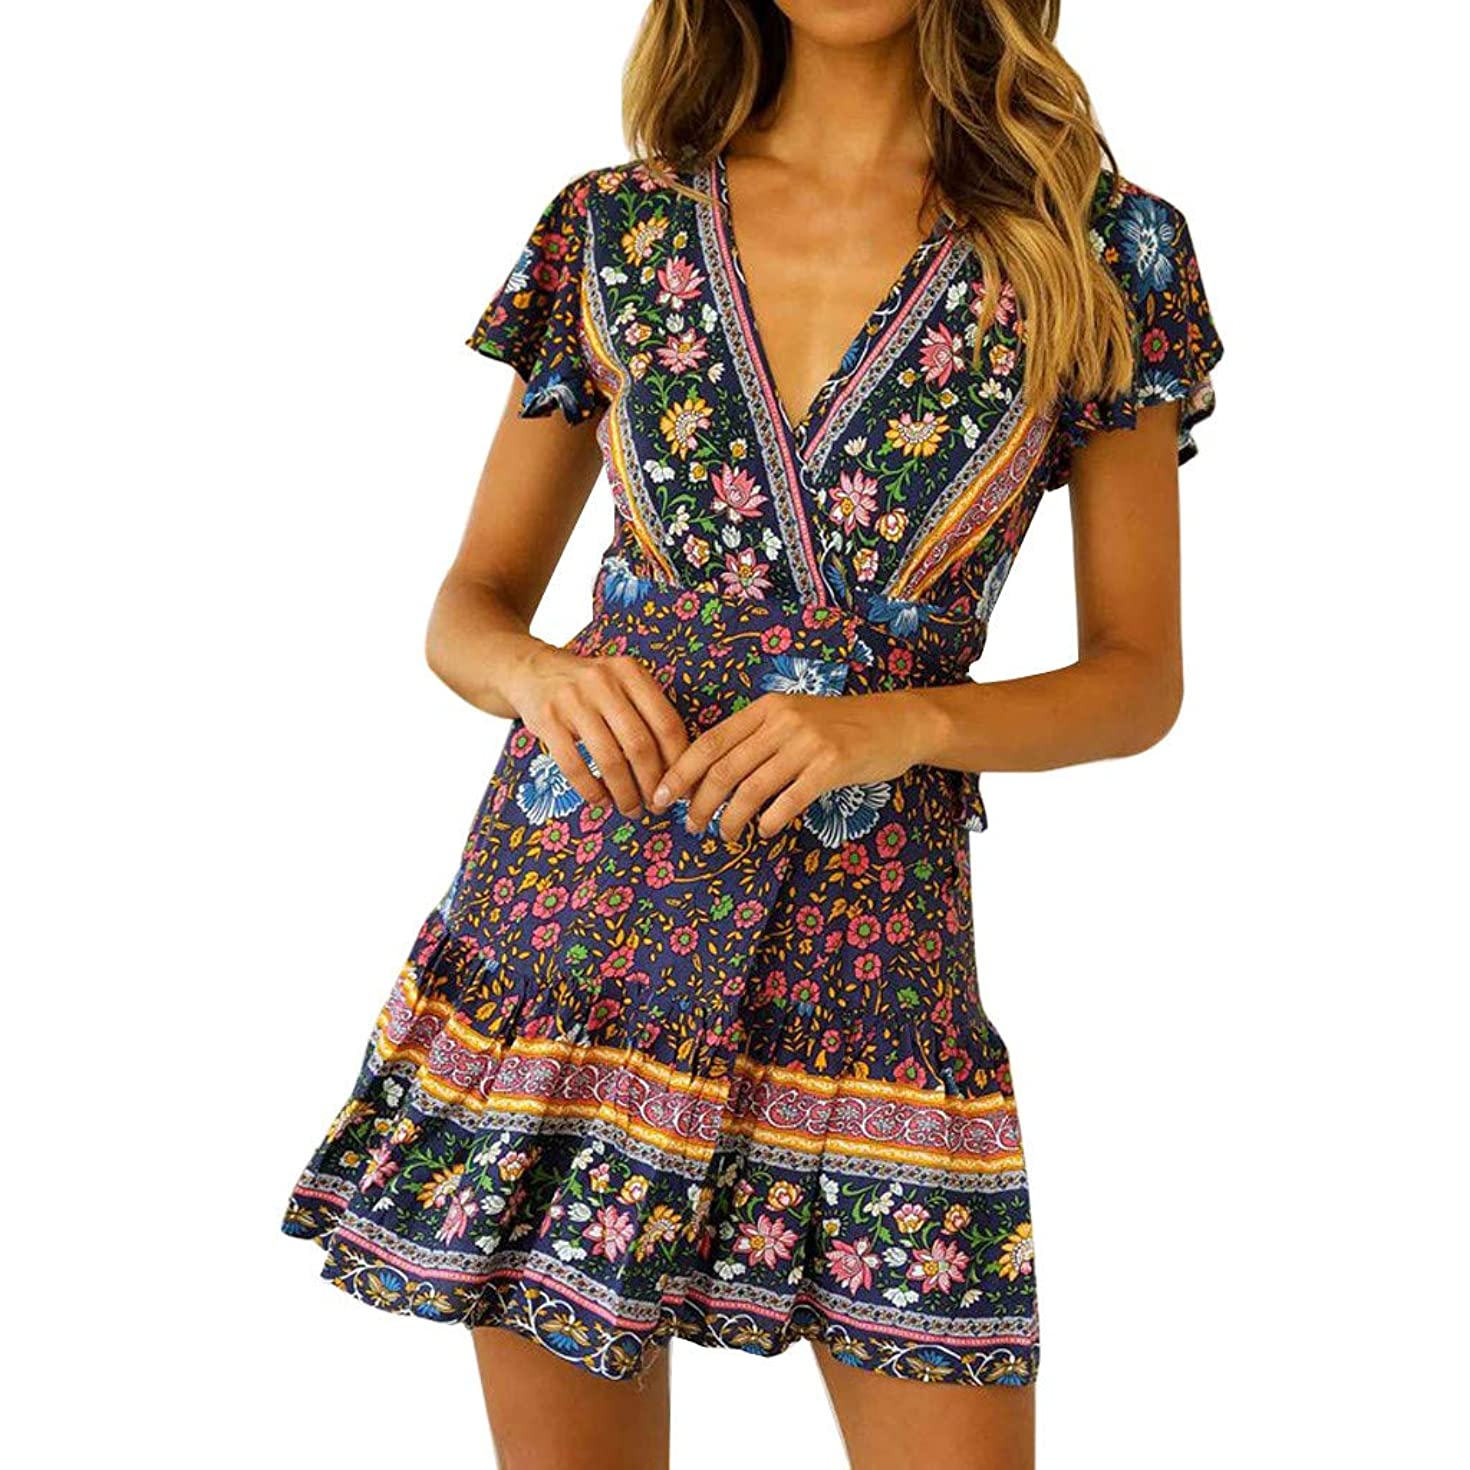 Women's Sexy Casual High Waist Bohemia Print V Neck Short Sleeve Midi Dress Ladies Summer Dress (Navy, M)